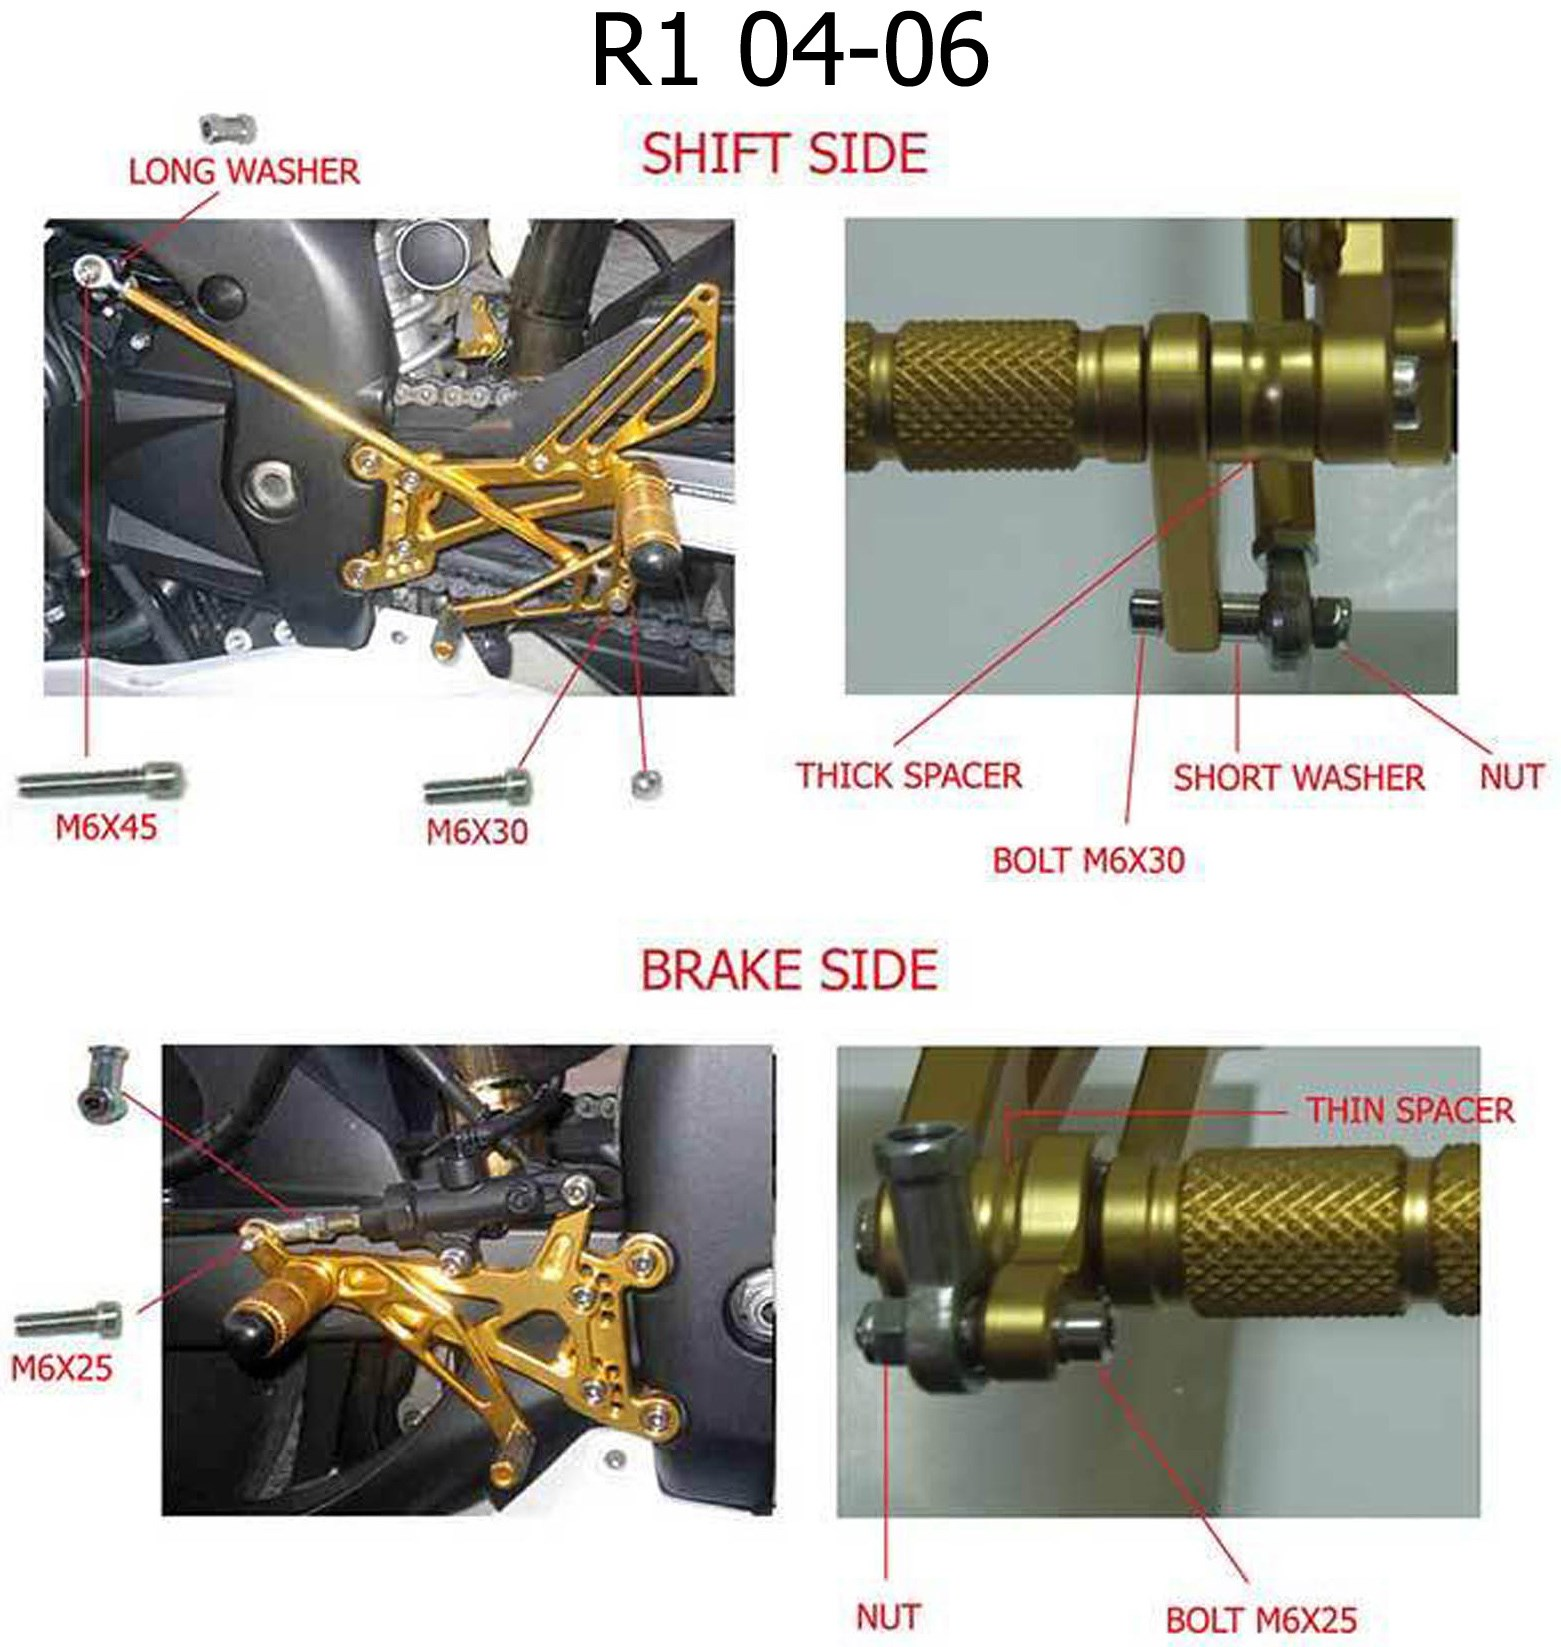 r1-04-06.jpg